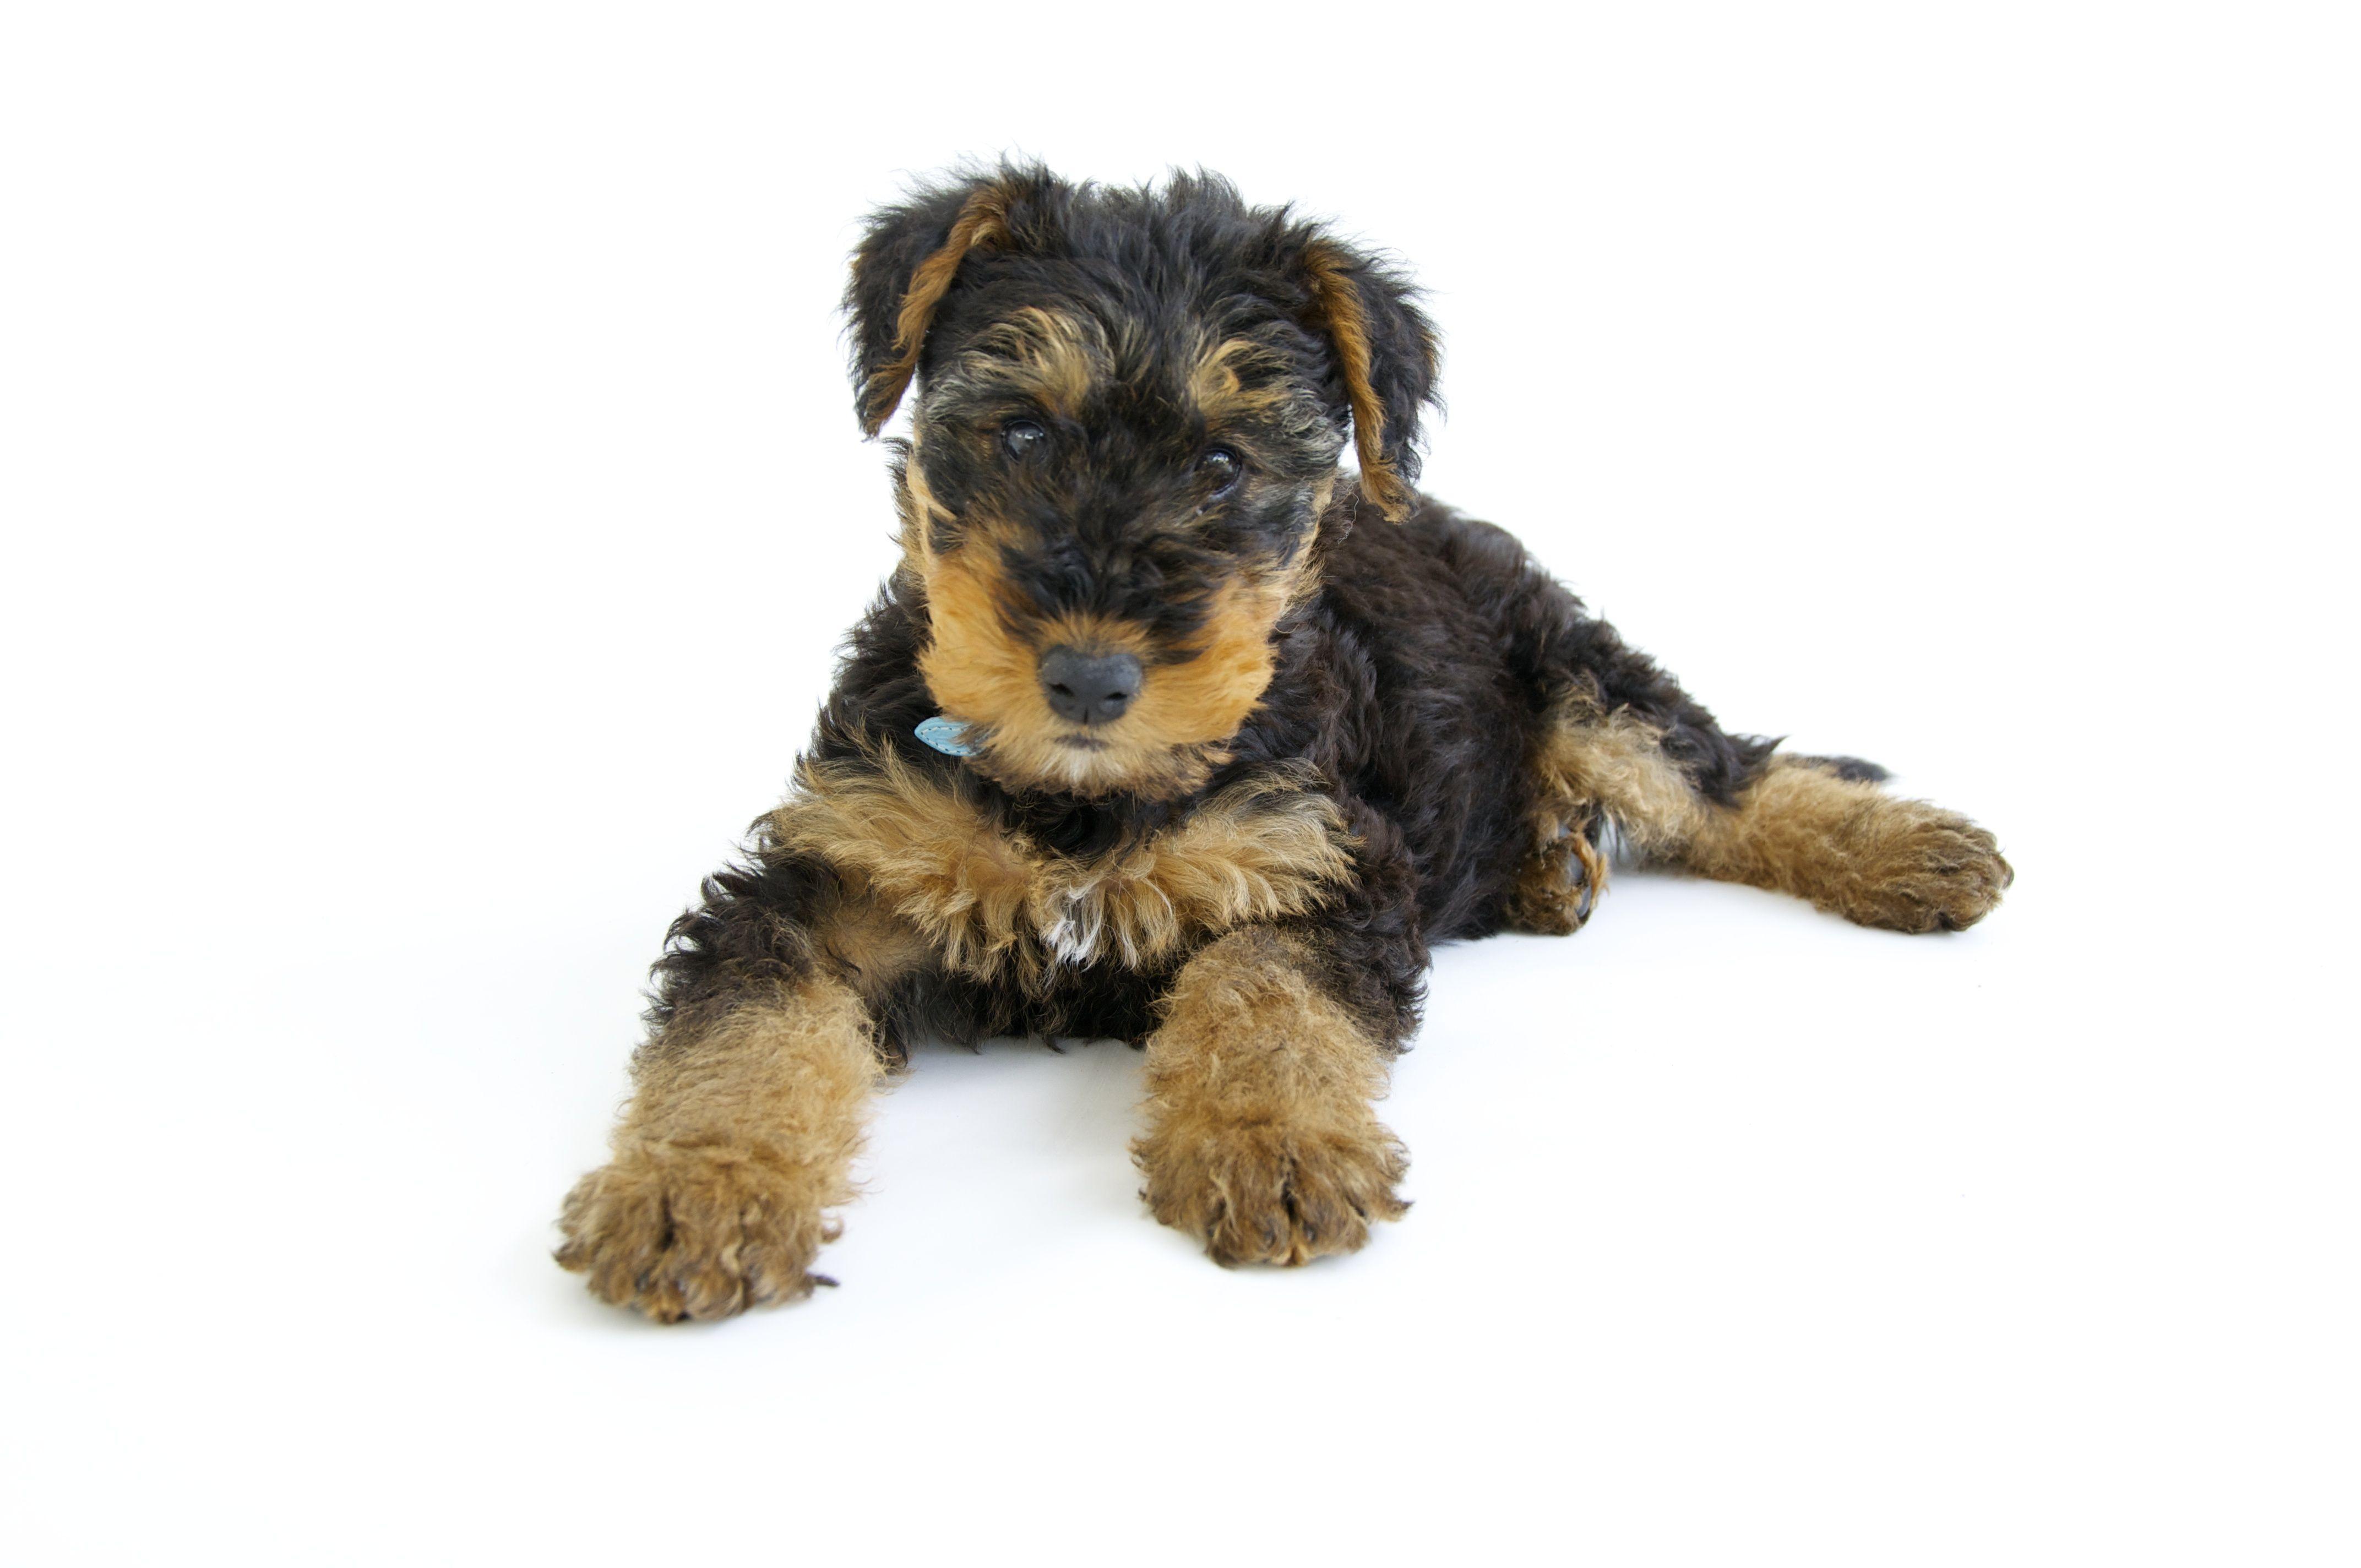 Teddy, airdale puppy